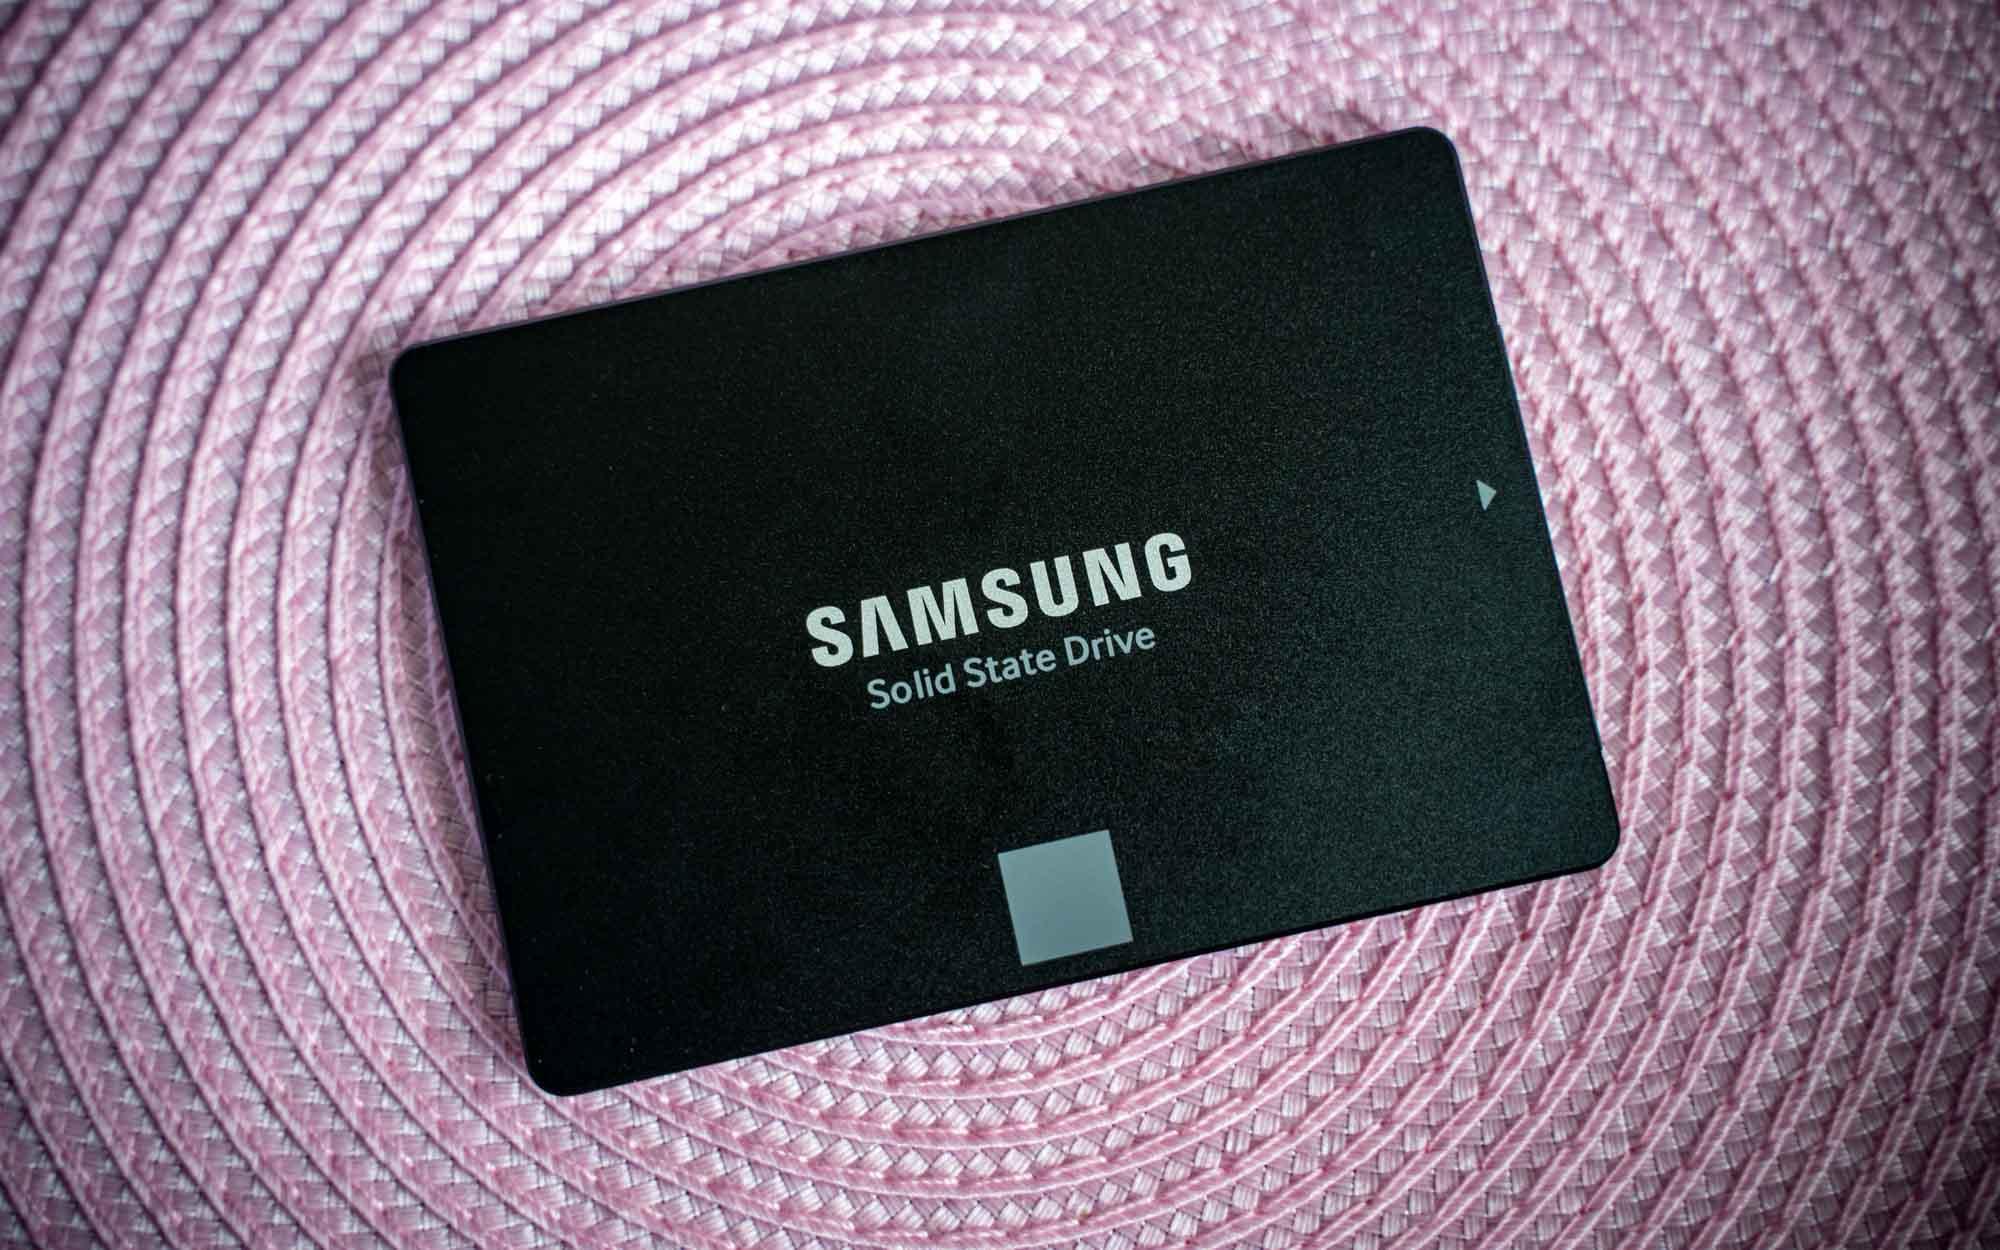 Samsung SSD 870 EVO 256GB